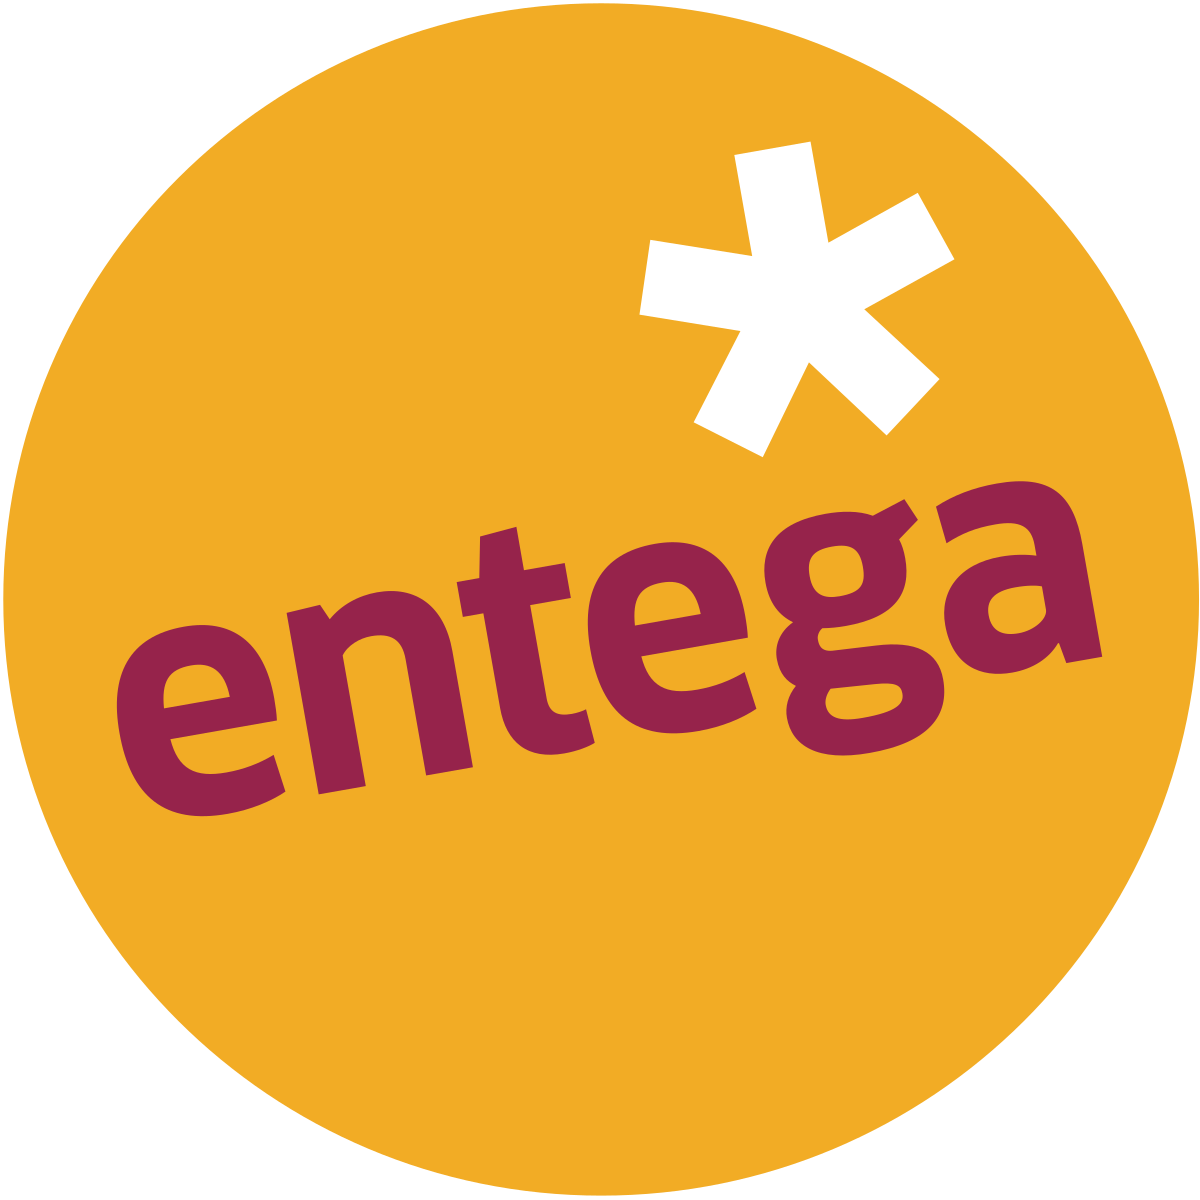 Charge card logo of Entega